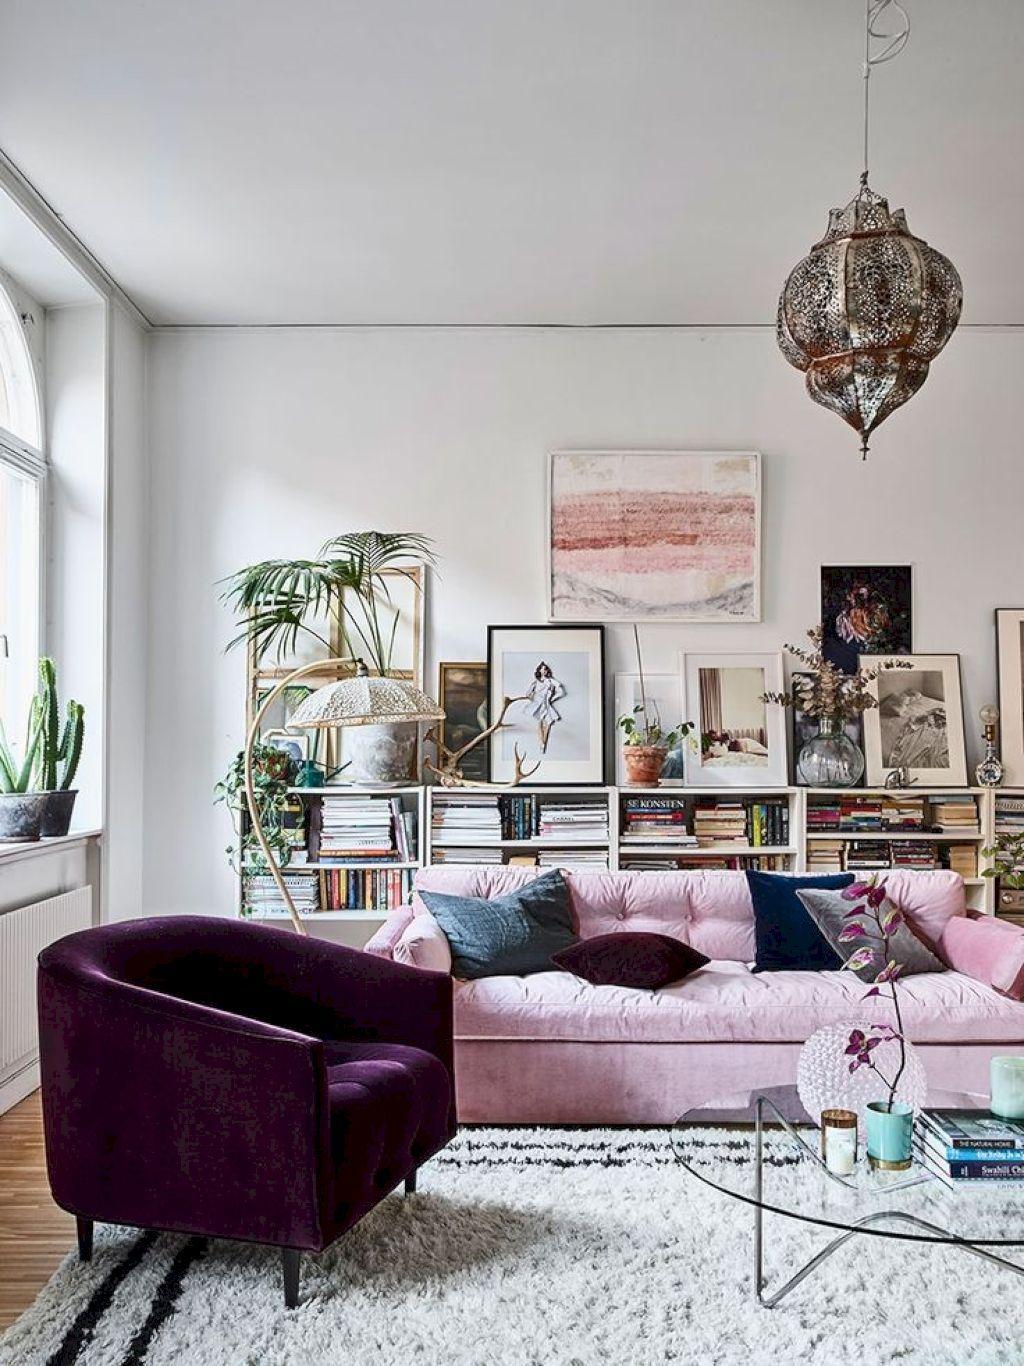 55 Gorgeous Bohemian Style Living Room Decor Ideas | Room decor ...